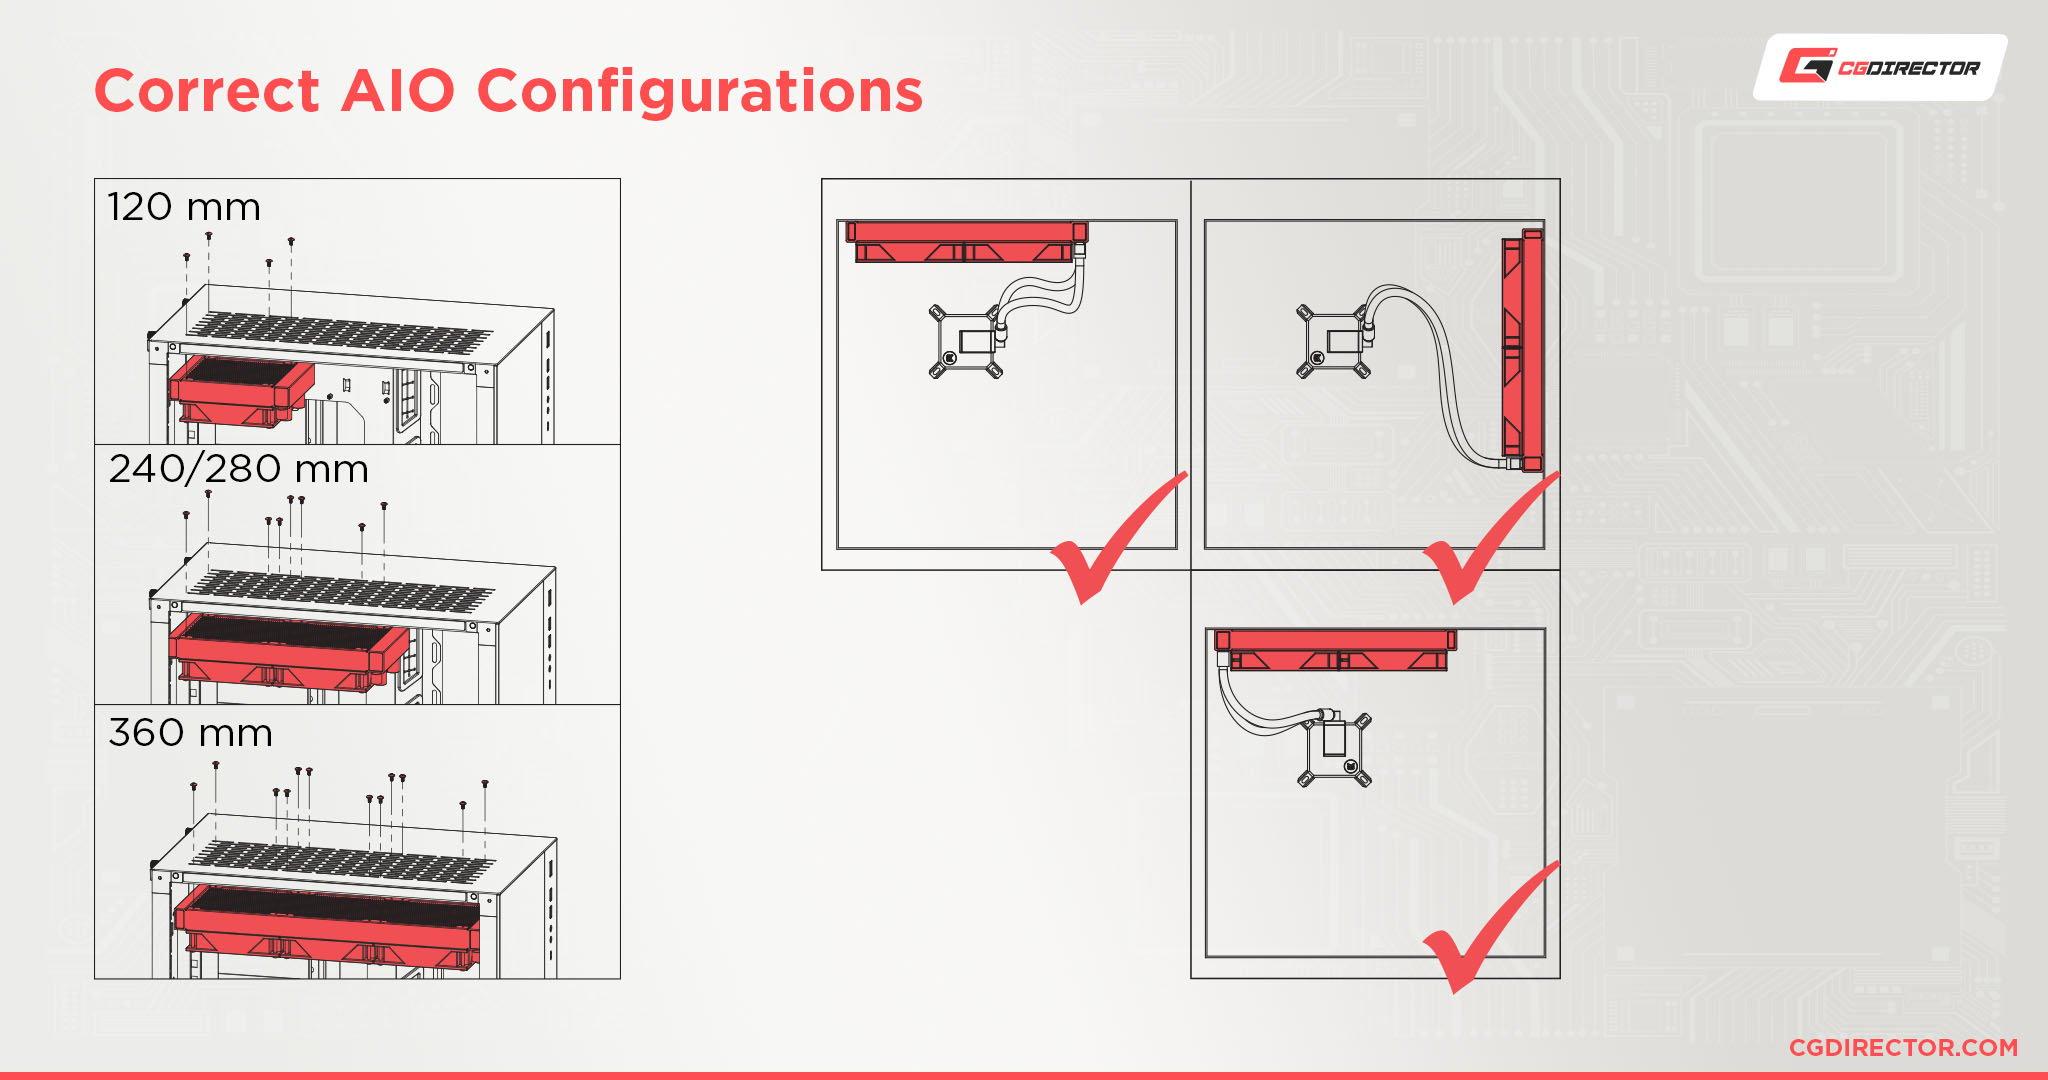 Correct AIO Configurations